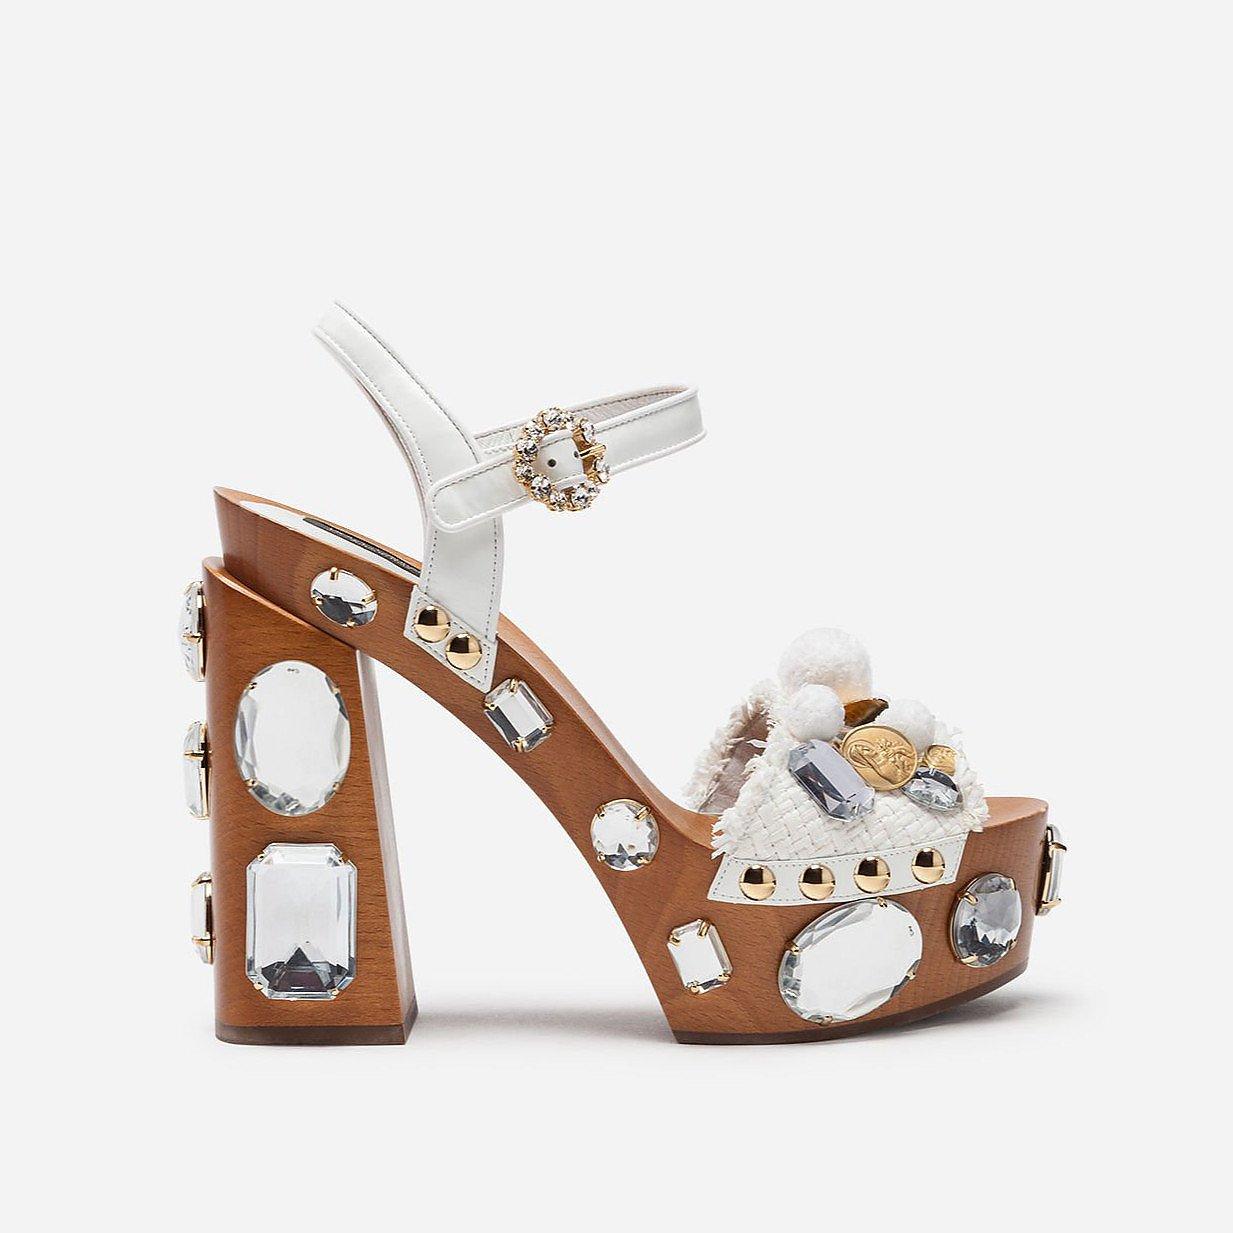 DOLCE & GABBANA Embellishment Raffia Platform Sandals